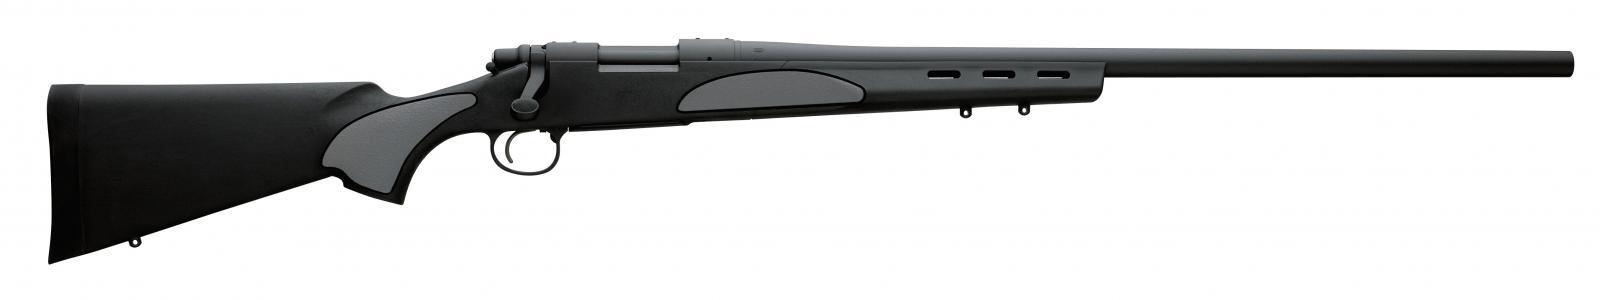 Carabine REMINGTON 700 SPS VARMINT